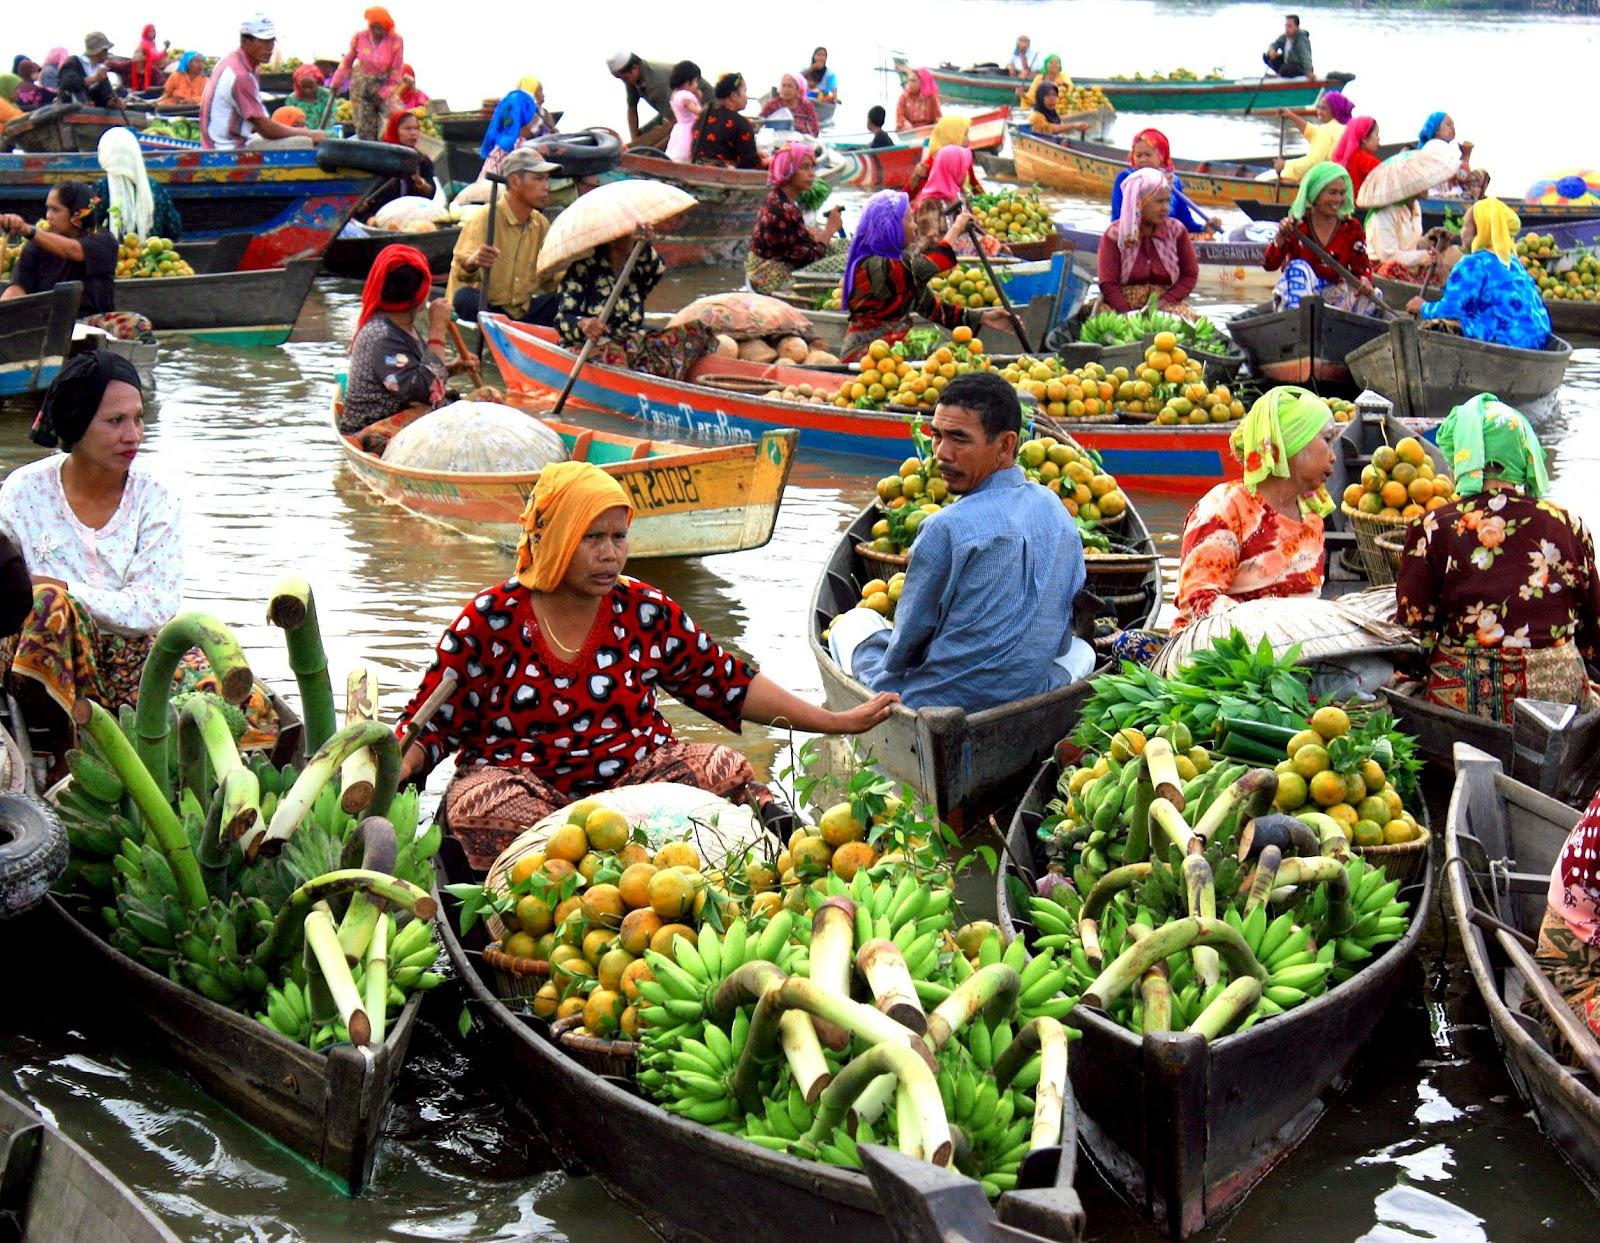 Live In Balikpapan Pasar Terapung Kalimantan Selatan